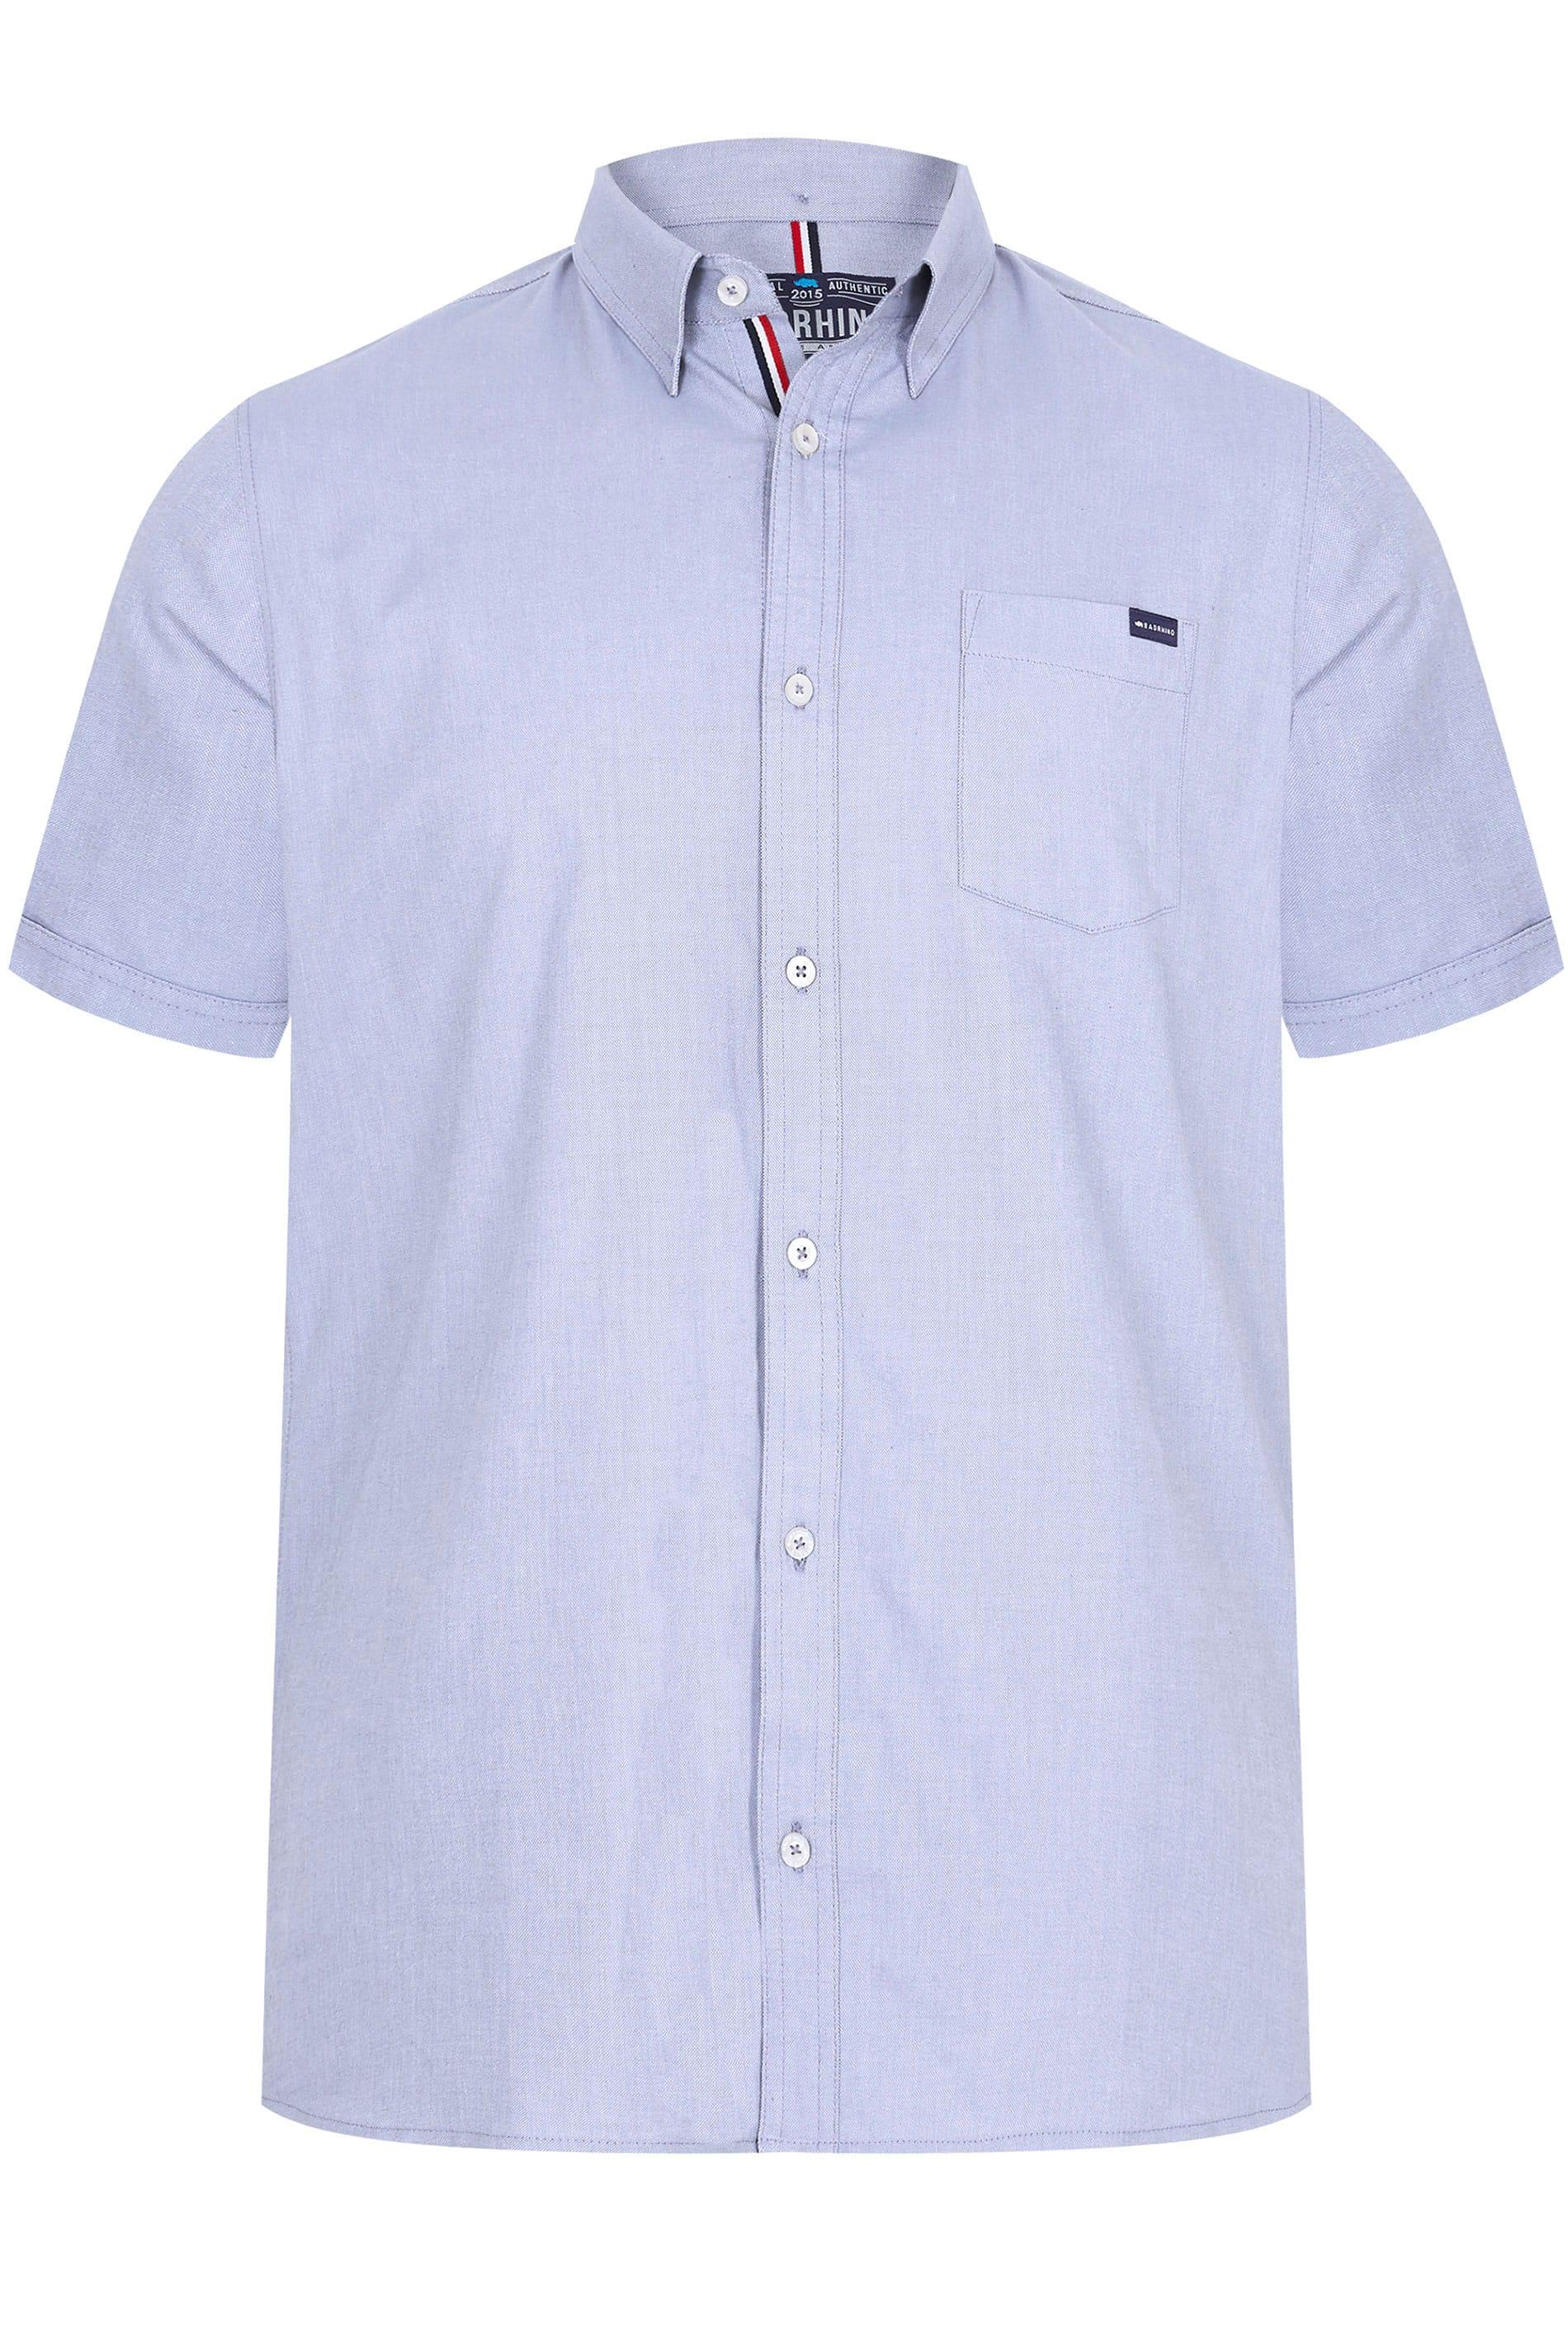 BadRhino Blue Linen Mix Shirt